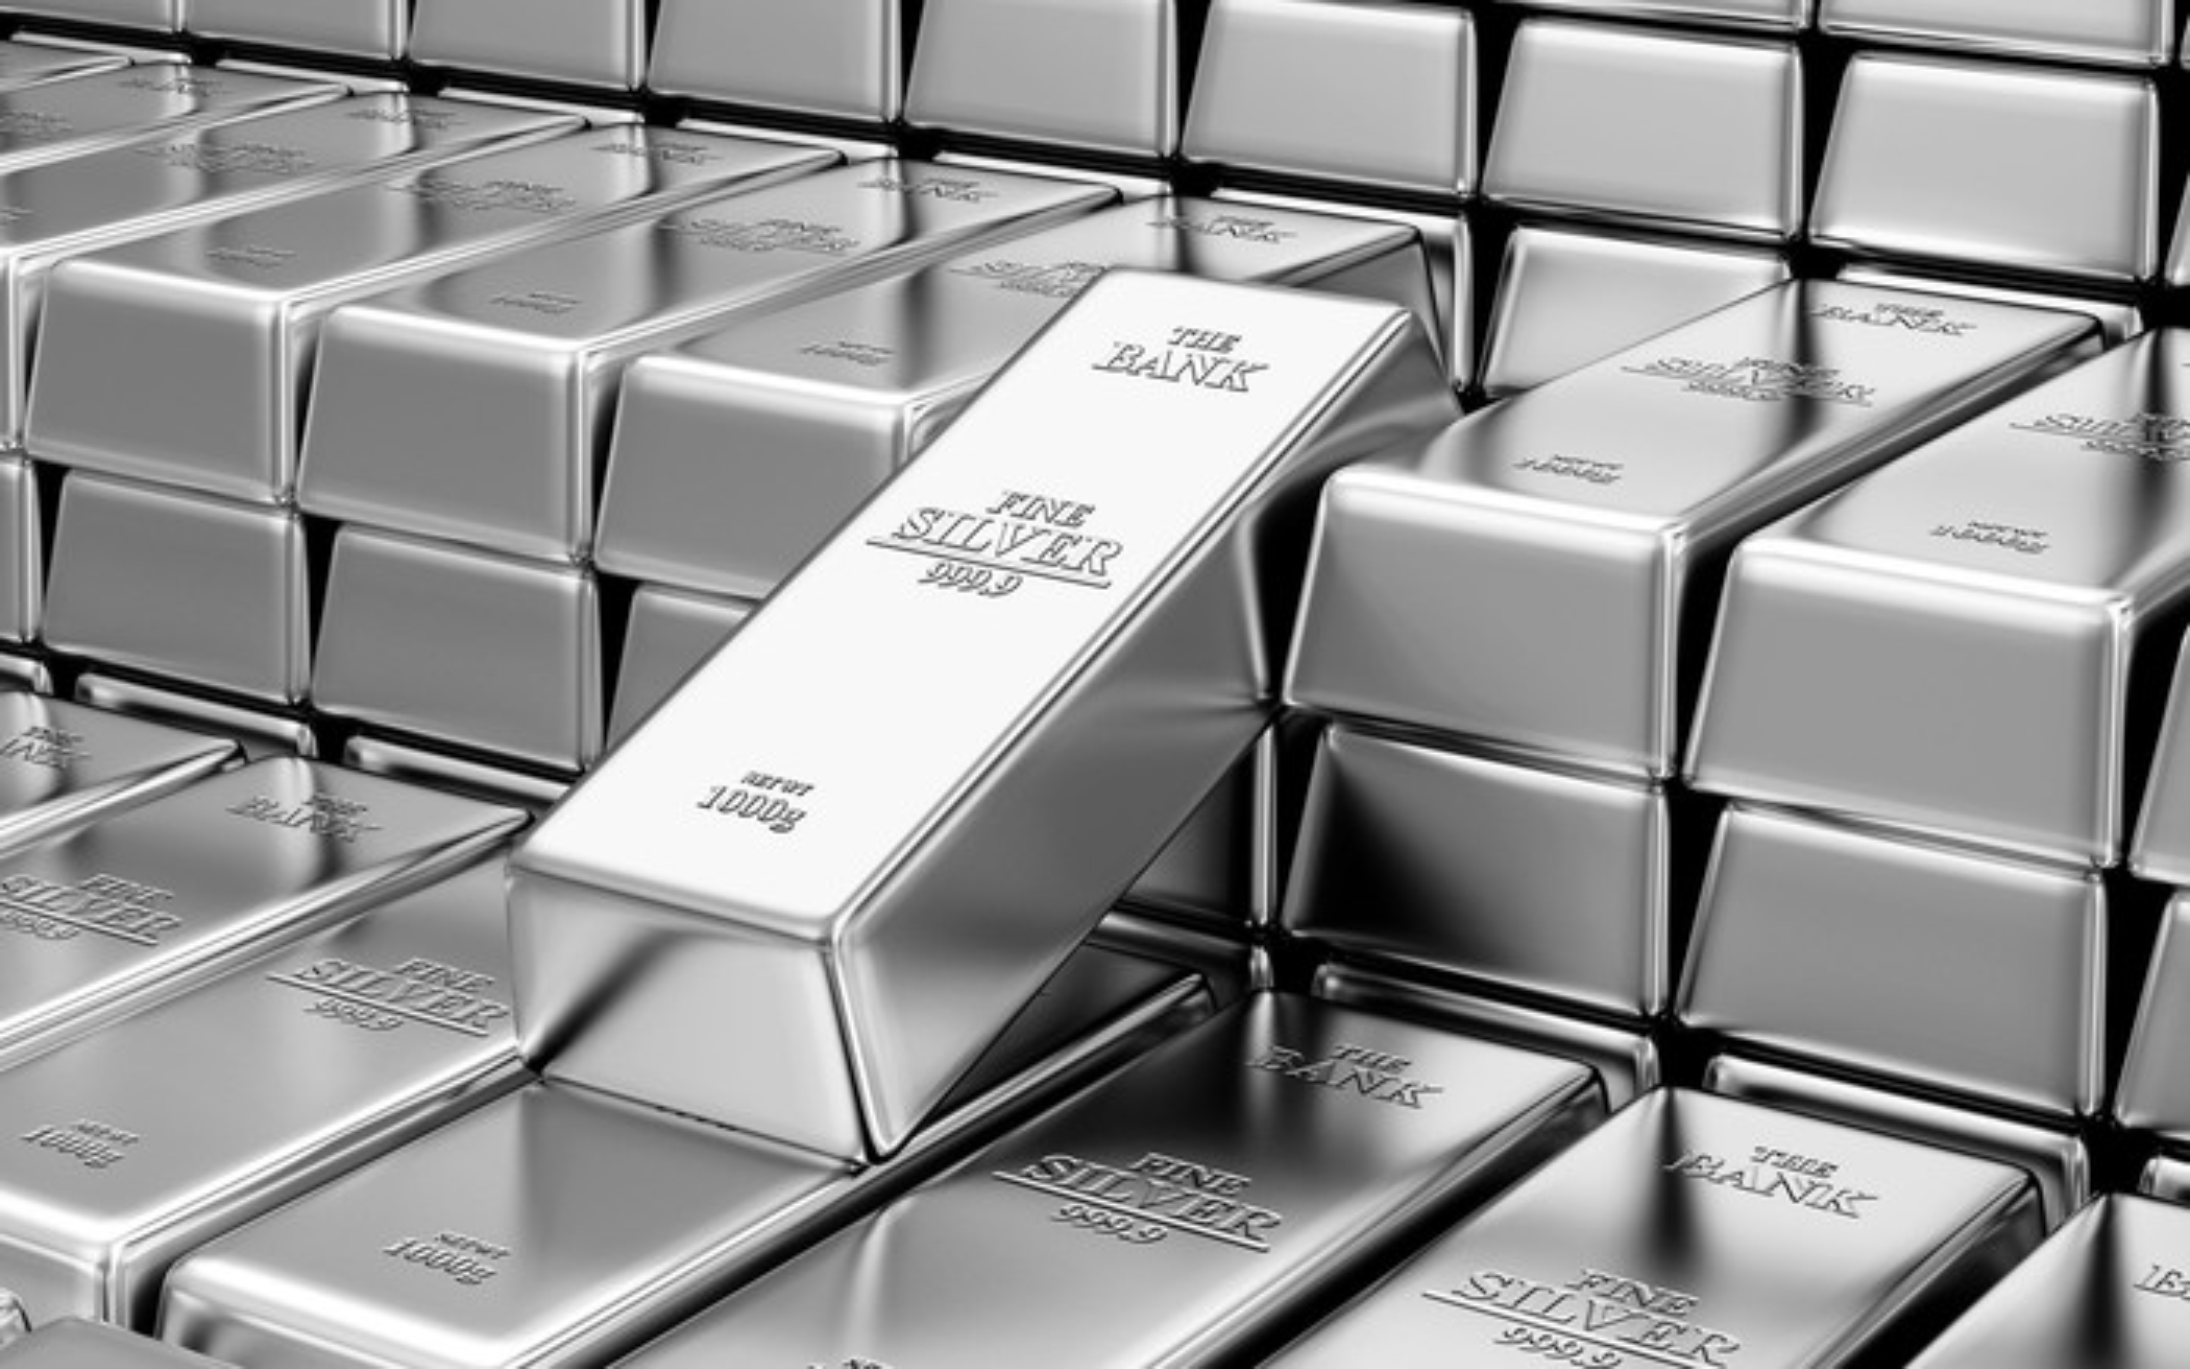 Stacks of silver bars.